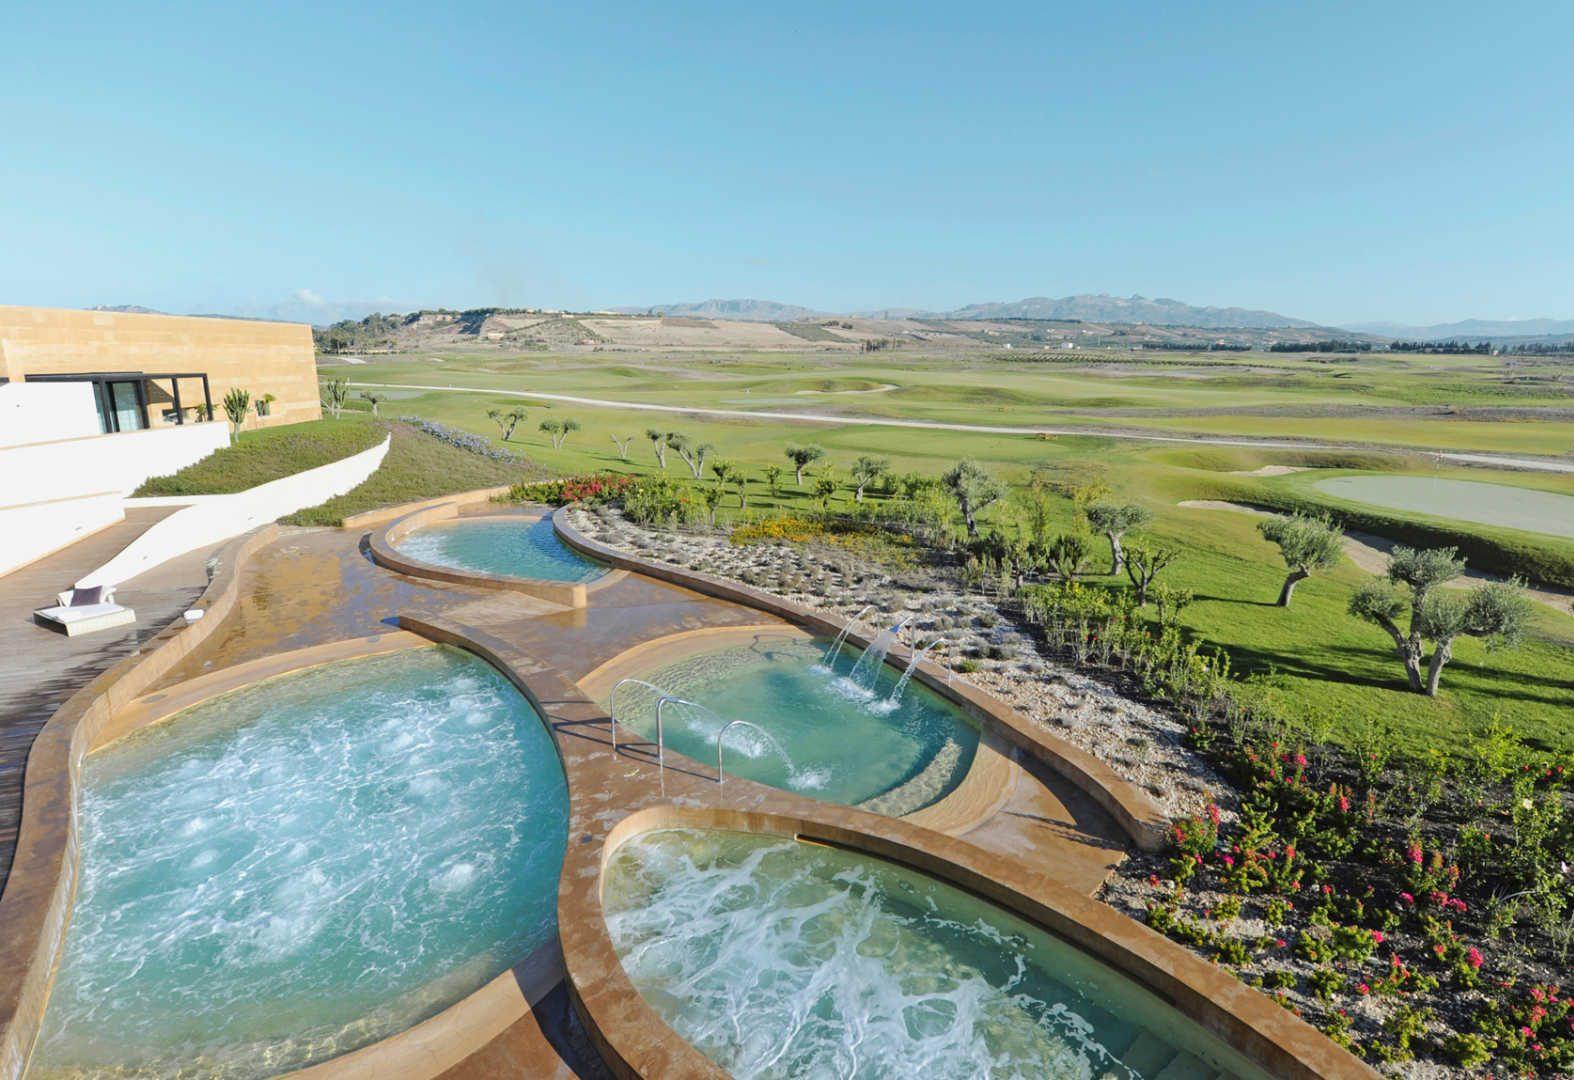 verdura-resort-a-rocco-forte-hotel-32401929-1473082274-ImageGalleryLightboxLarge